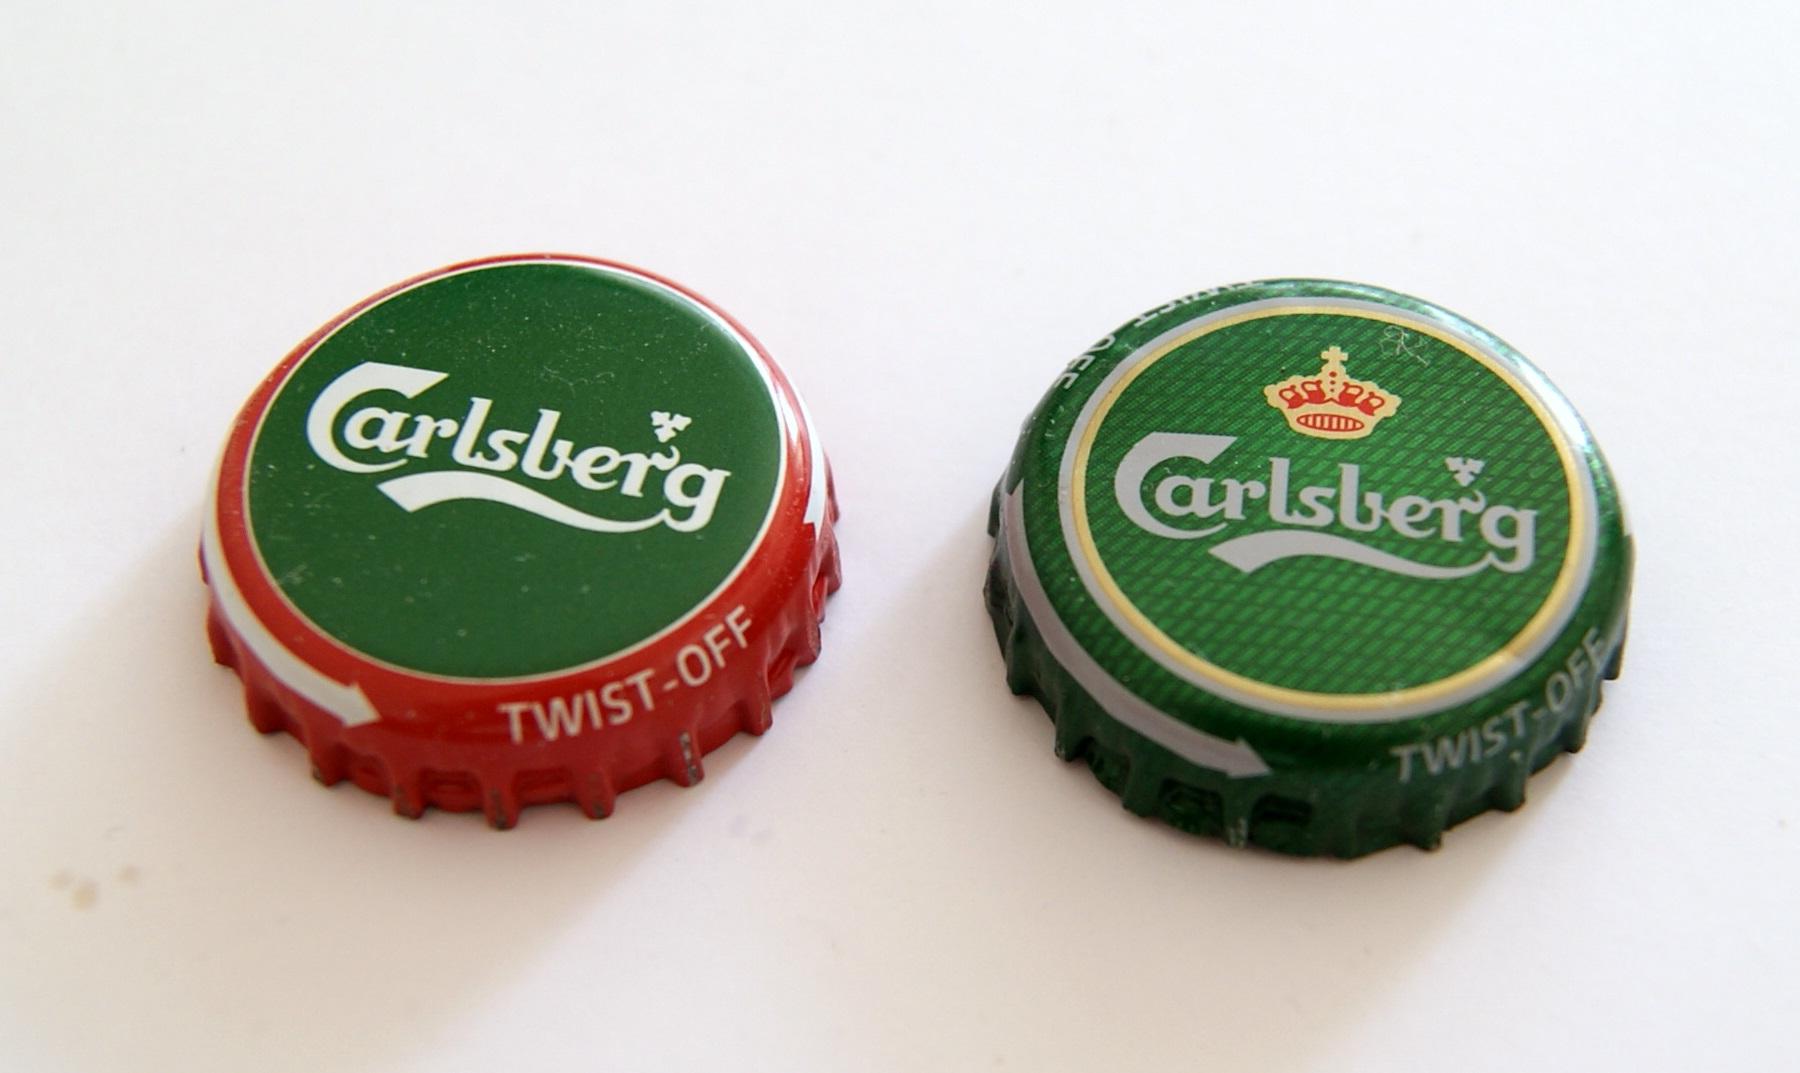 File:Kapsle Carlsberga JPG - Wikimedia Commons